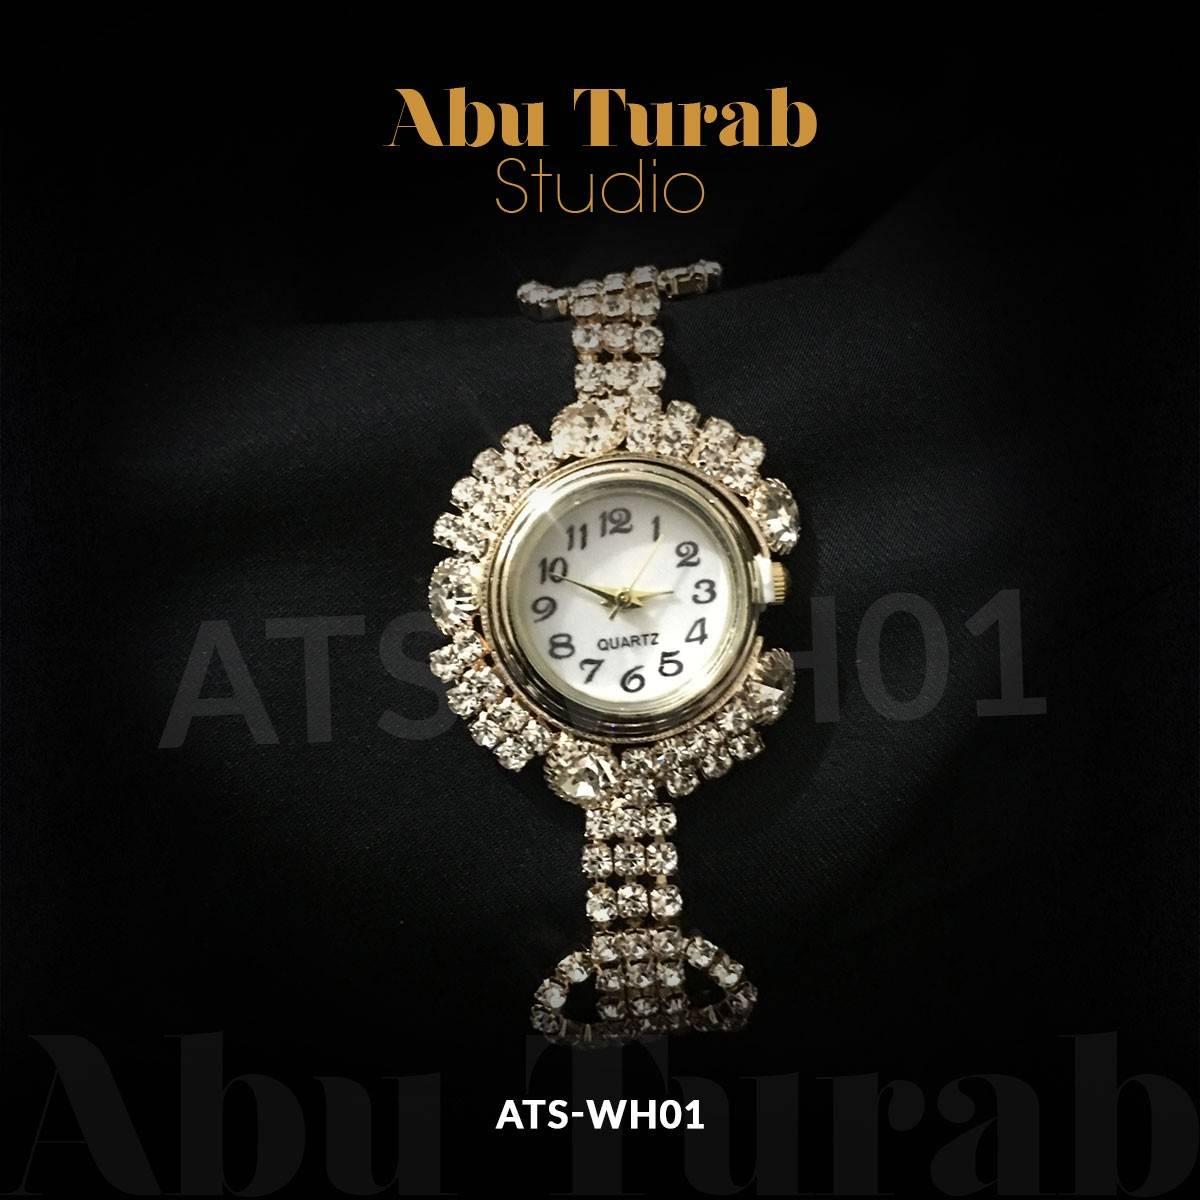 Abu Turab Studio - Luxury Women Watch Bling Bling Fashion Jewellery Crystal Diamond Rhinestone Ladies Watches Steel Band Round Dial Analog Clock Classic Quartz Female Charm Bracelet Dress Wristwatches